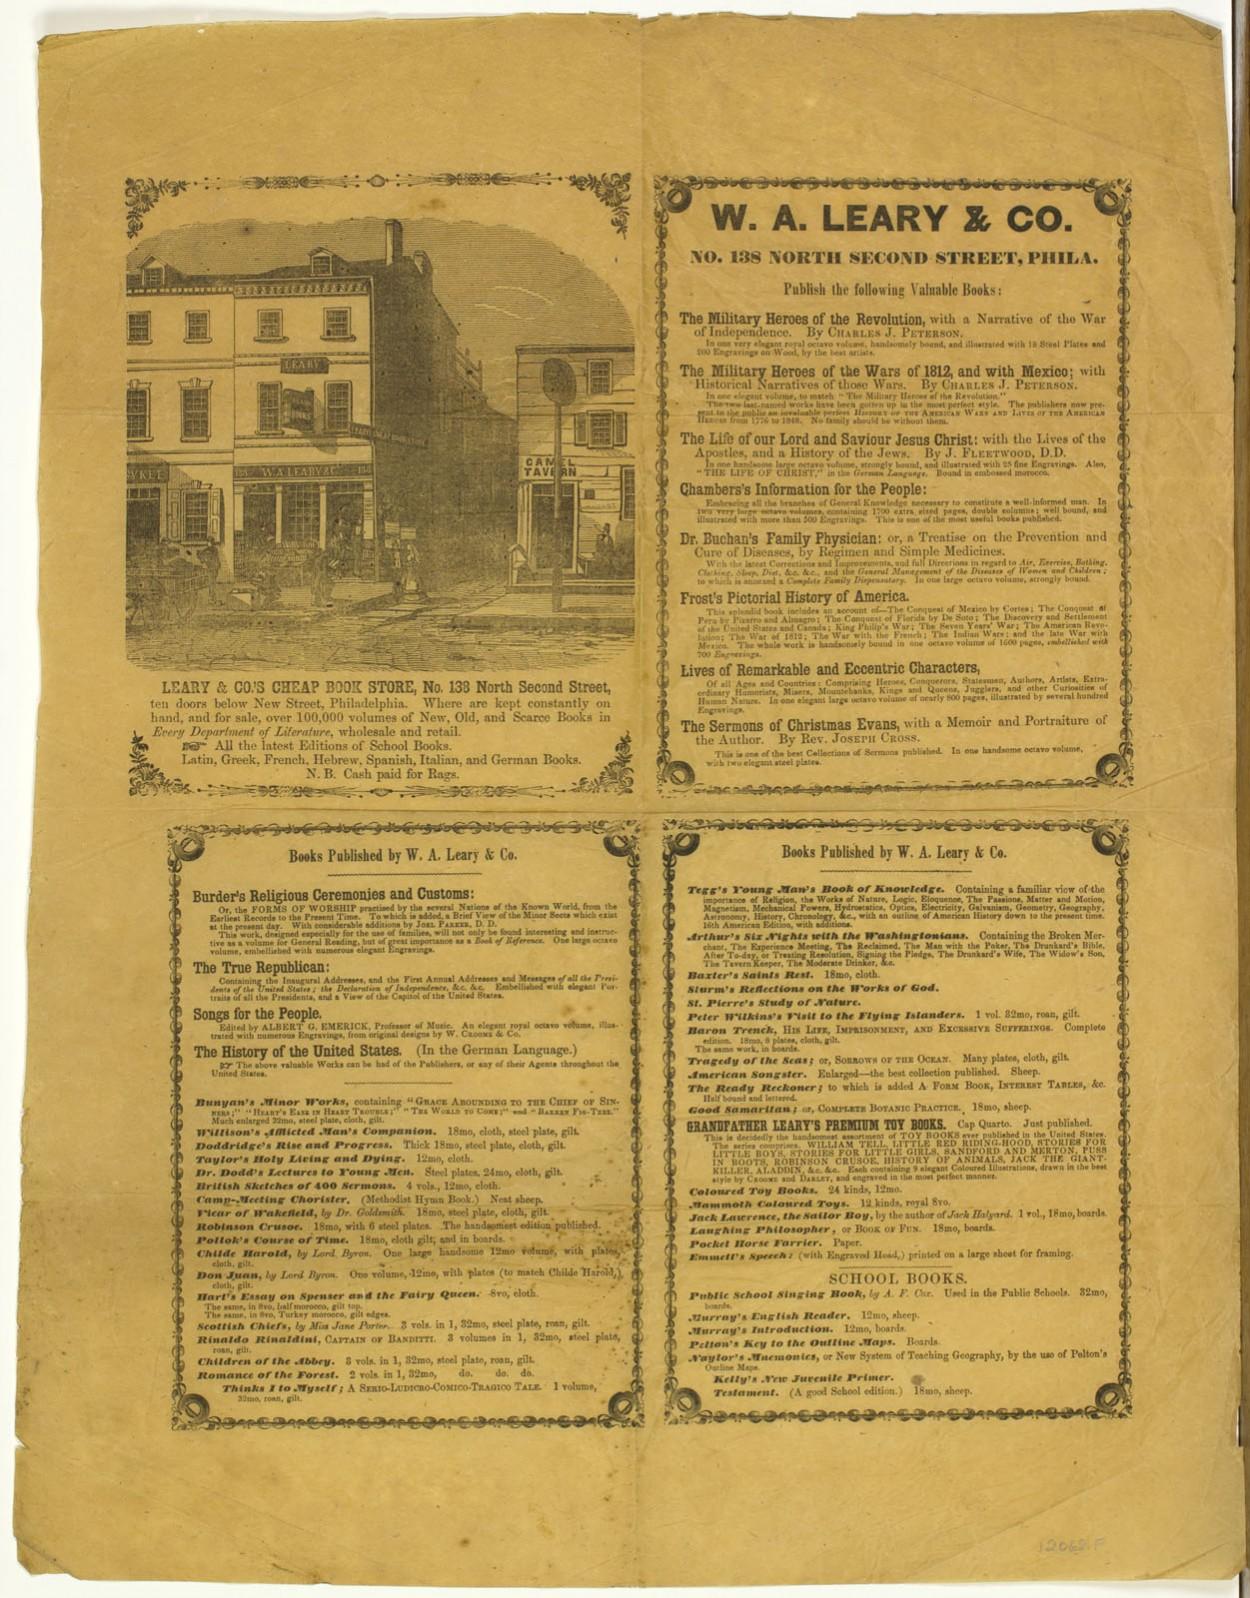 W. A. Leary & Co. Leary & Co.'s Cheap Book Store, No. 138 North Second Street, Ten Doors Below New Street, Philadelphia. Philadelphia, ca. 1849-1852.